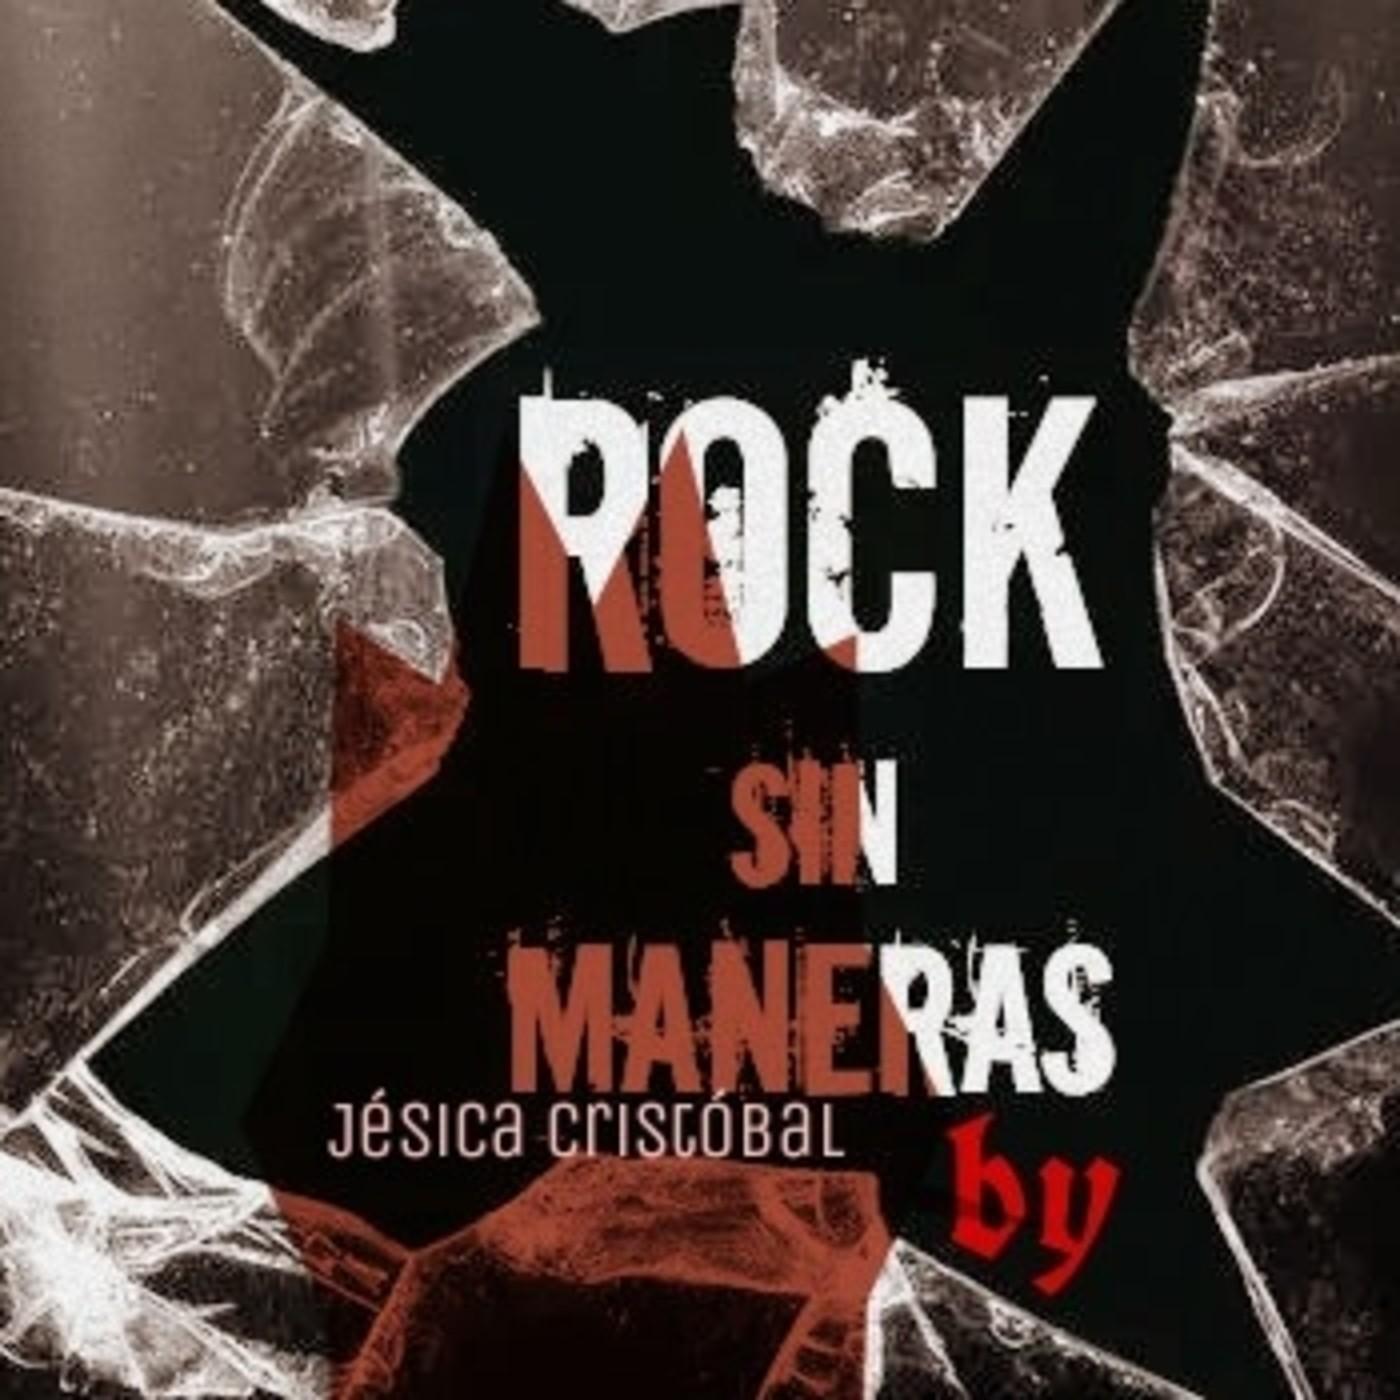 RocksinManeras 04x25: entrevista EDEN